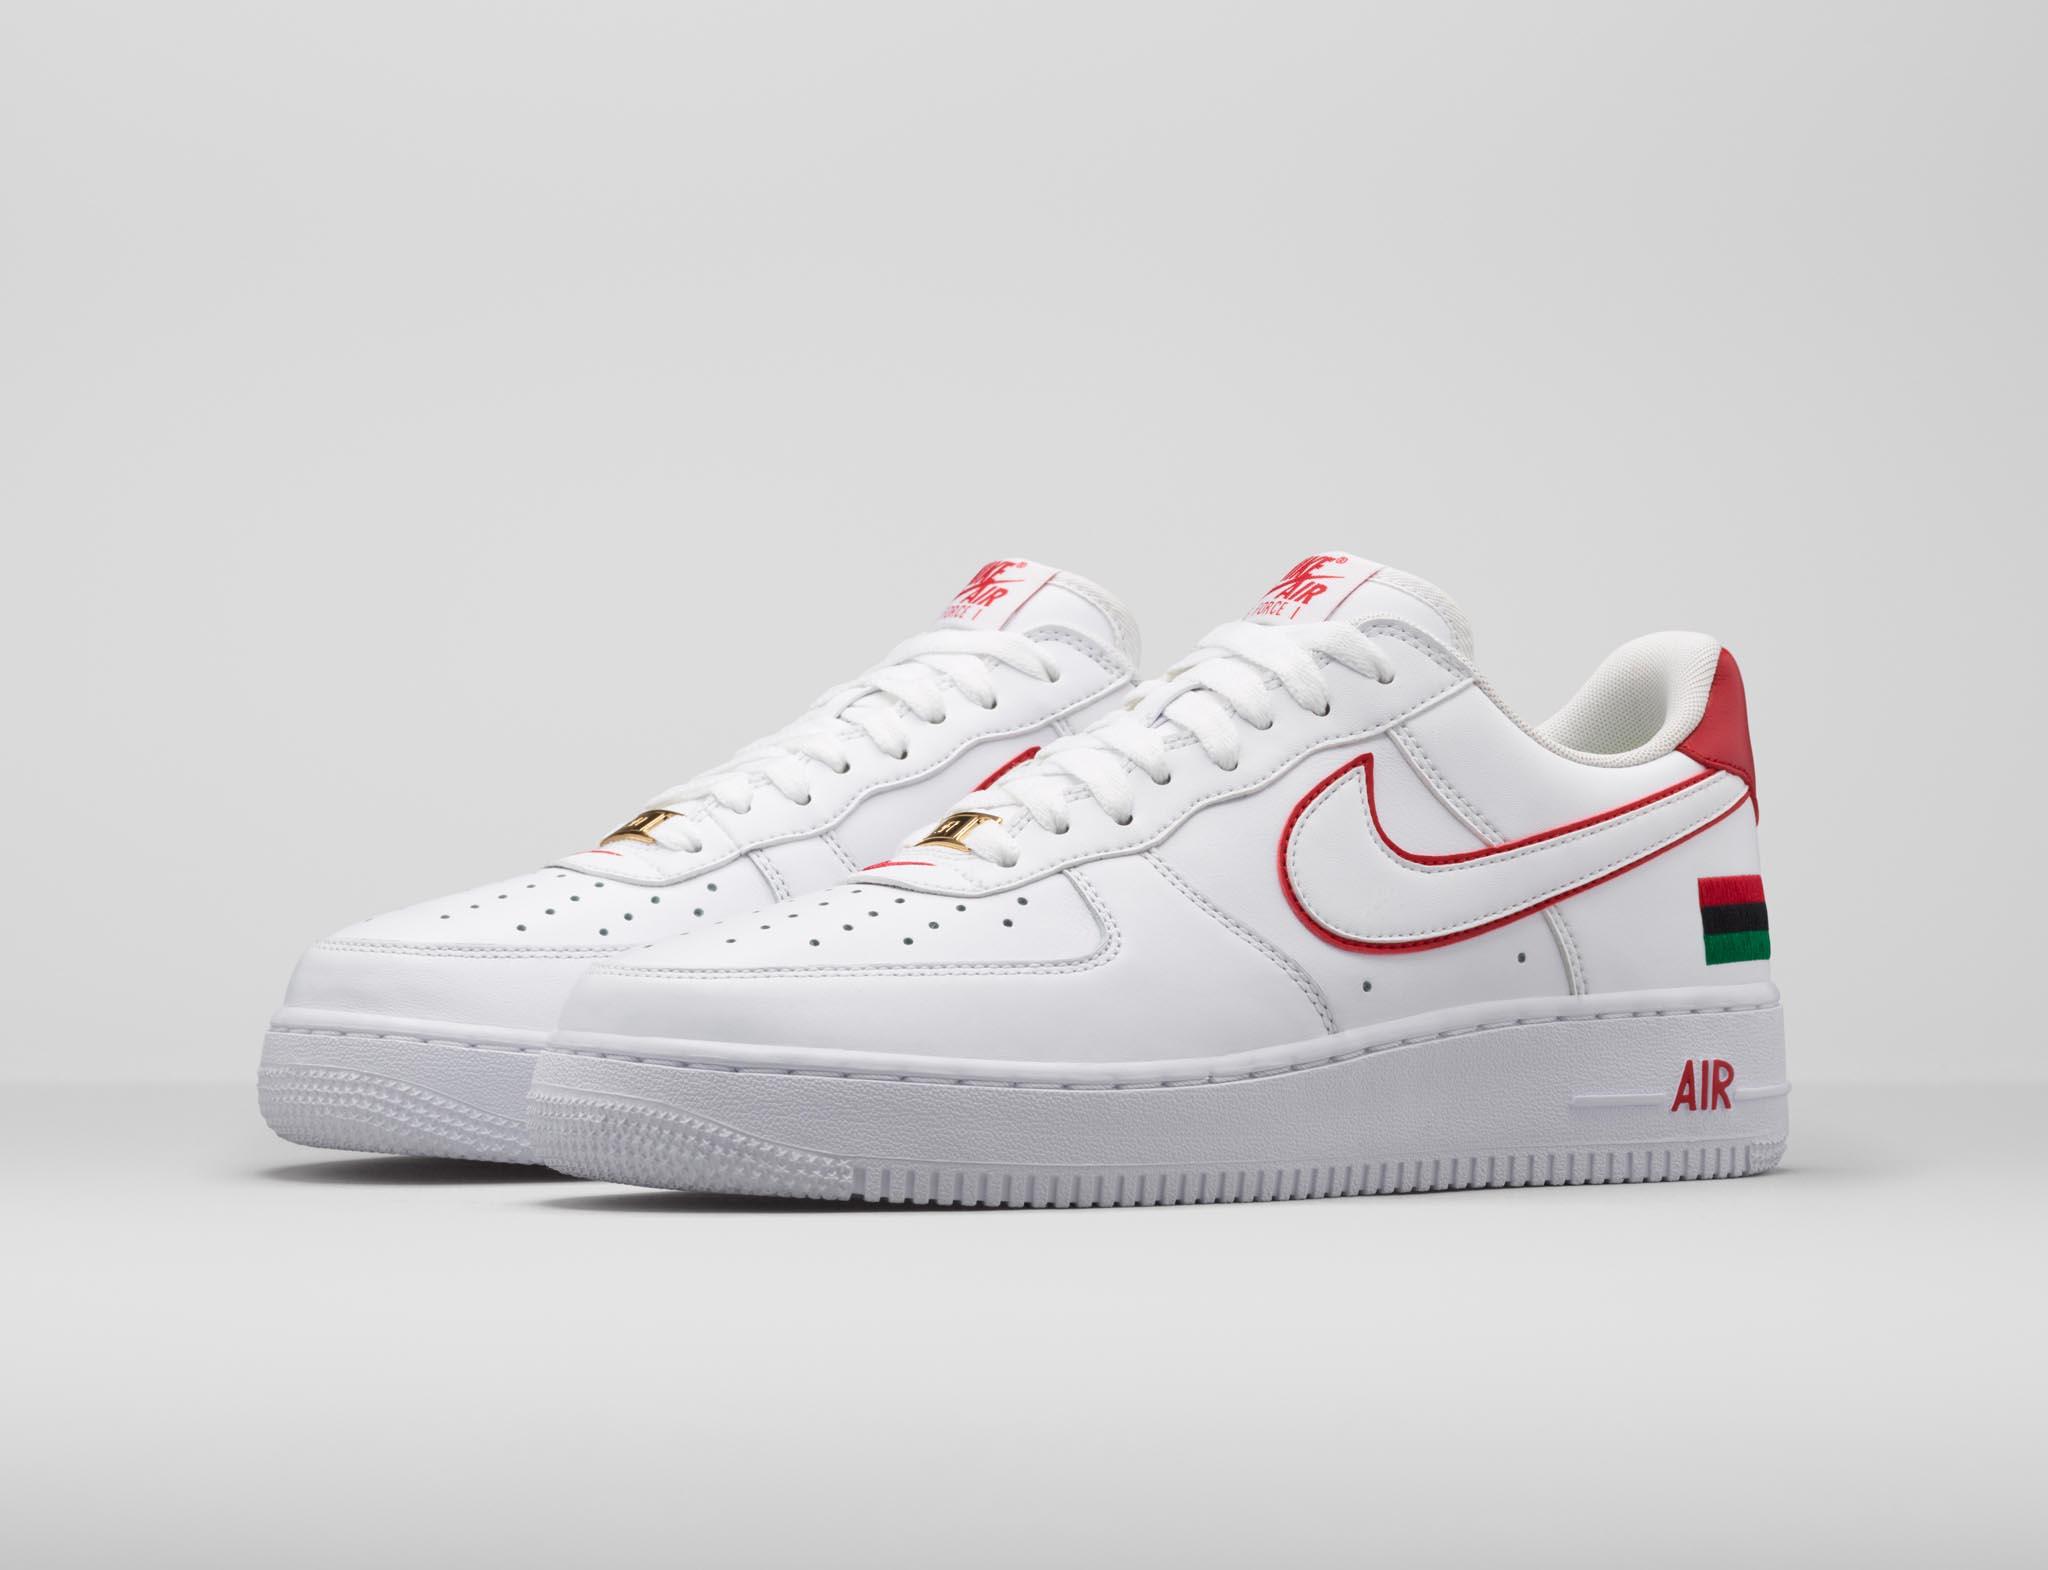 Nike Air Force 1 Nike Tennis Blanches sites à vendre vente visite le moins cher HWsmtWjJ3